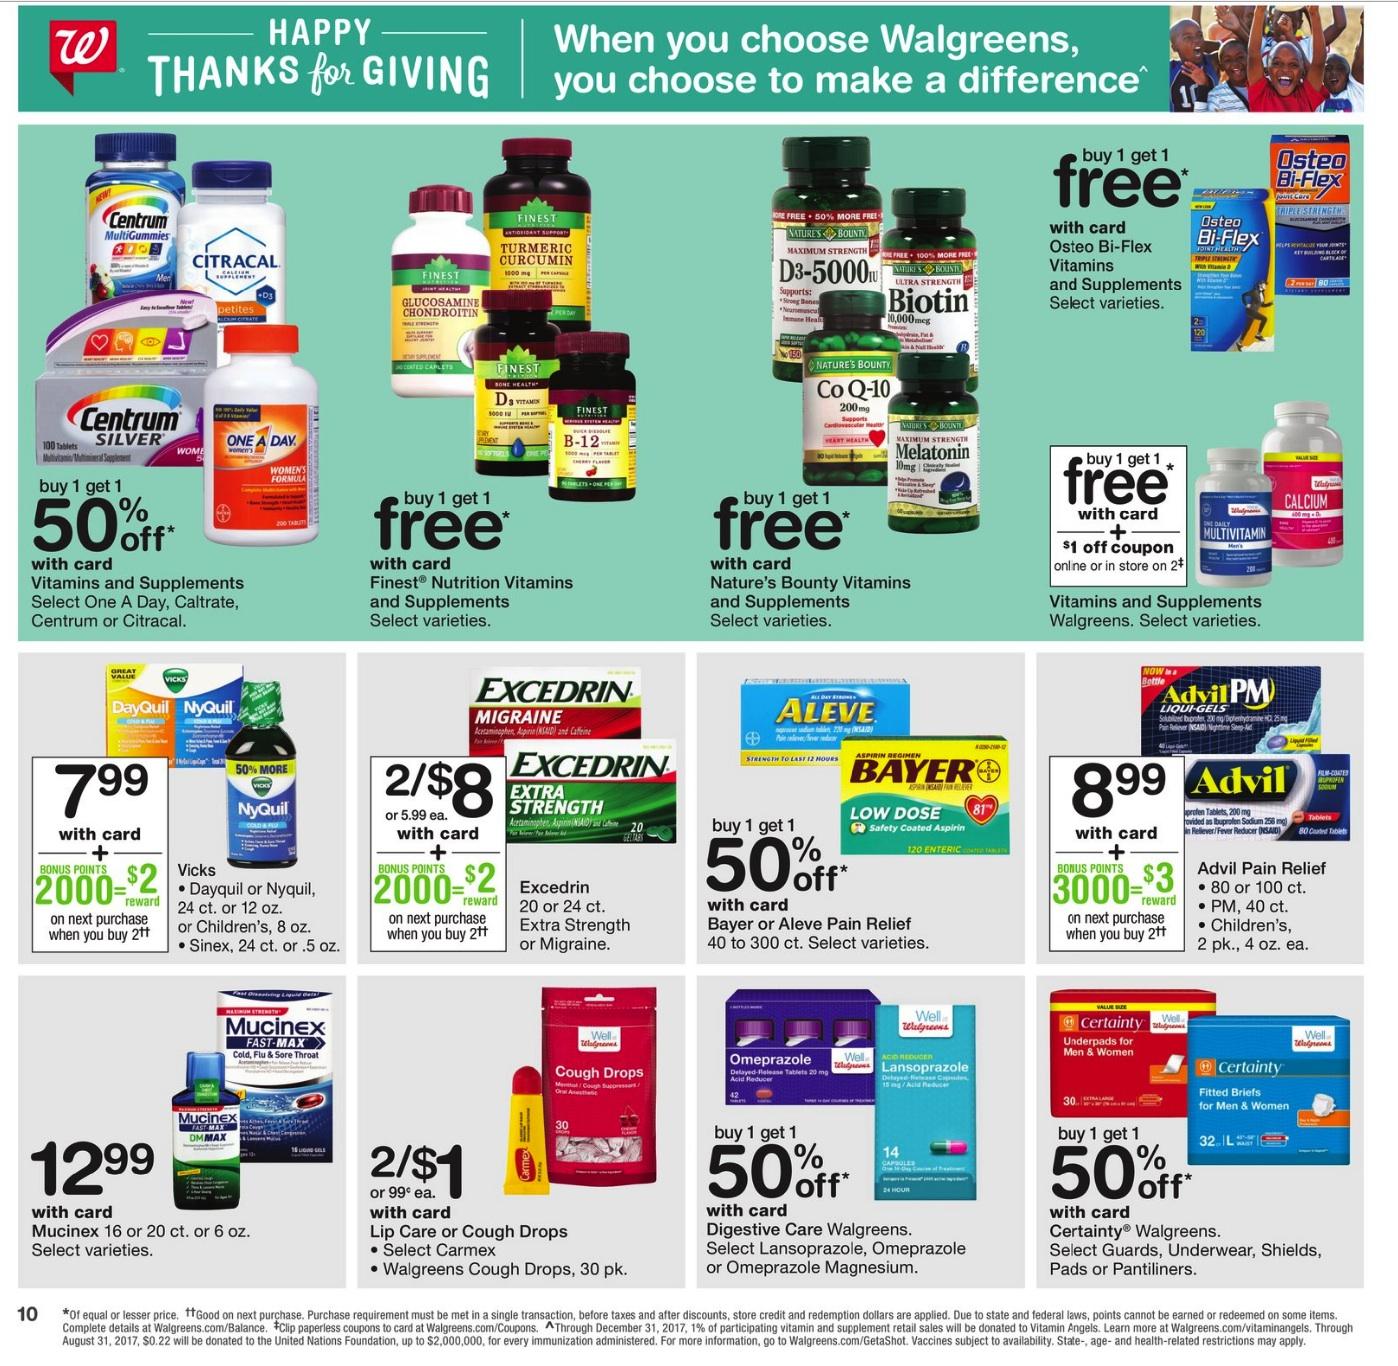 Walgreens Black Friday 2018 Ad - Funtober